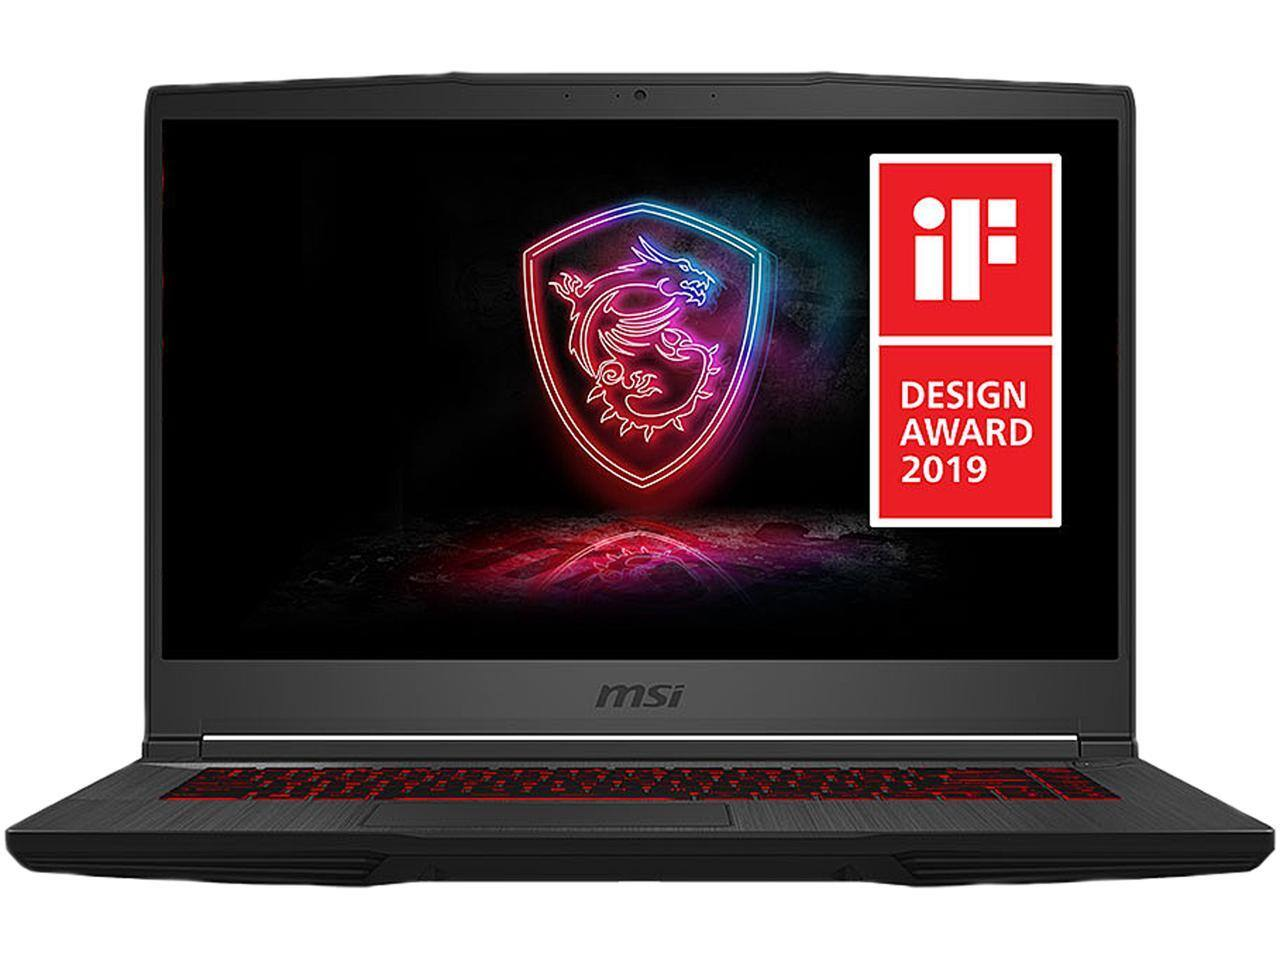 "Newegg: MSI GF65 Thin [15.6"" 144Hz Intel Core i5-9300H GeForce RTX 2060 8GB DDR4 512GB SSD] Gaming Laptop (plus $100 MIR & Free MSI Gaming Mouse) $899"